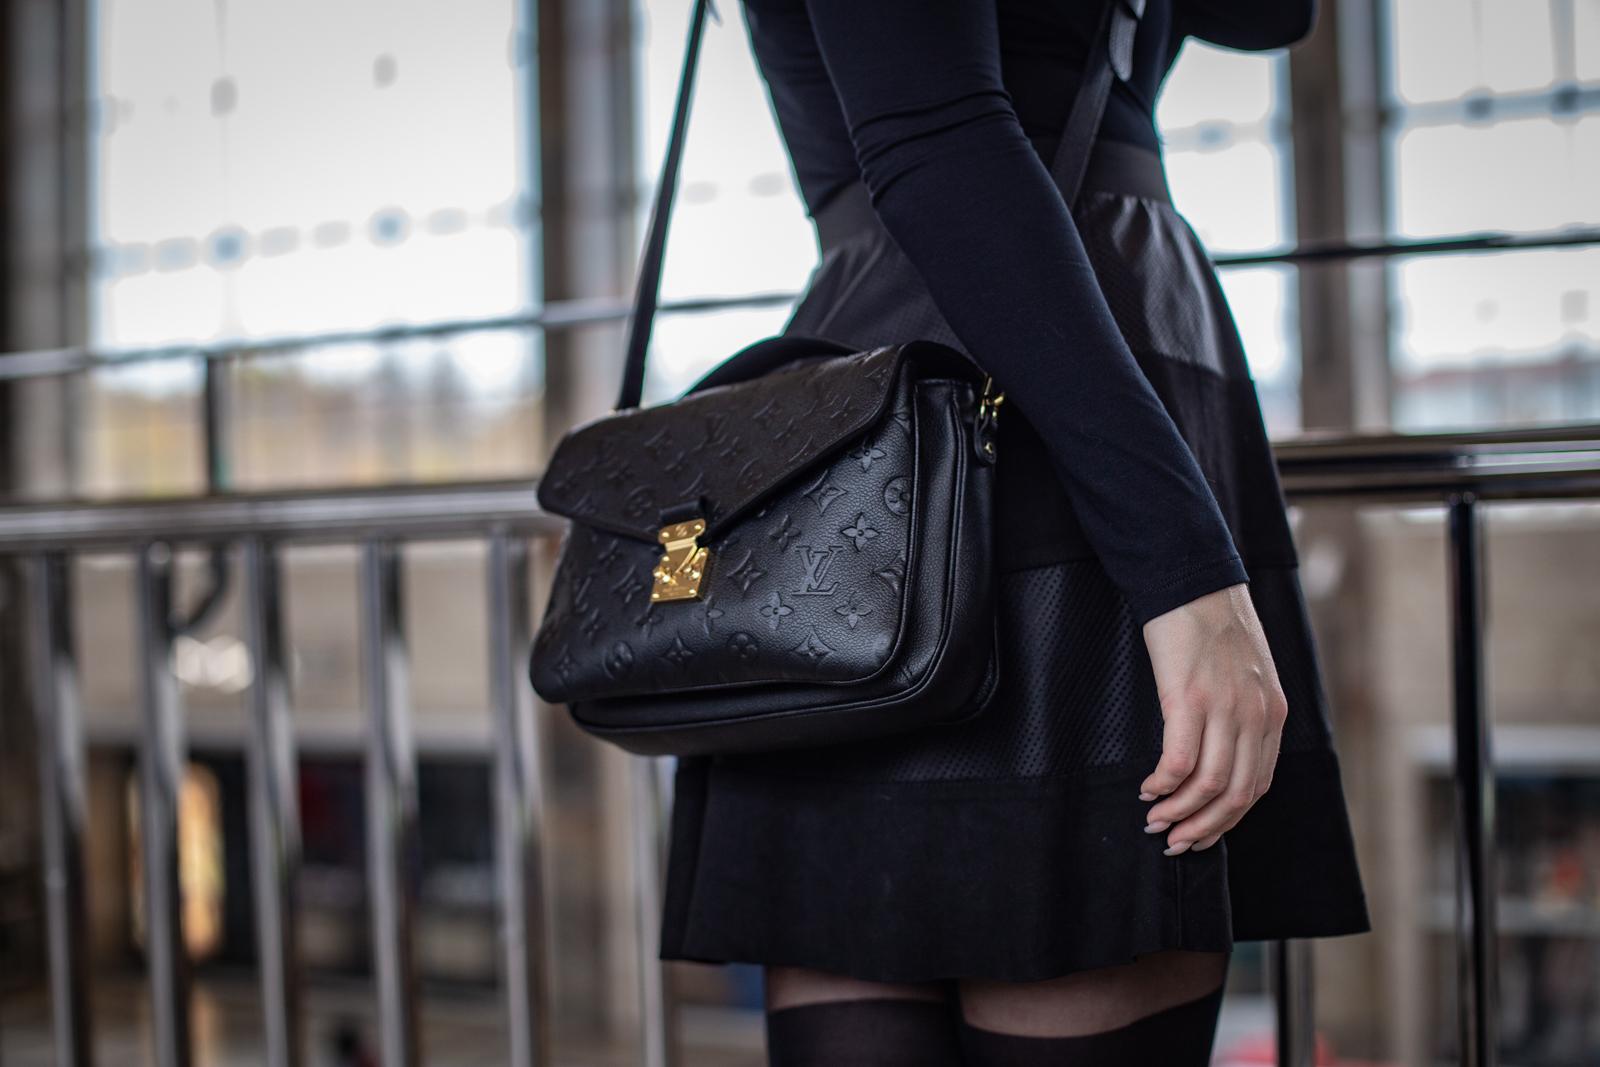 1600-louis-vuitton-metis-louisvuitton-fashion-outfit-justizpalast-violetfleur-violet-fleur-nadjanemetz-nadja-nemetz-austrianblogger-austrian-blogger-beautyblogger-fashionblogger-modeblogger--436